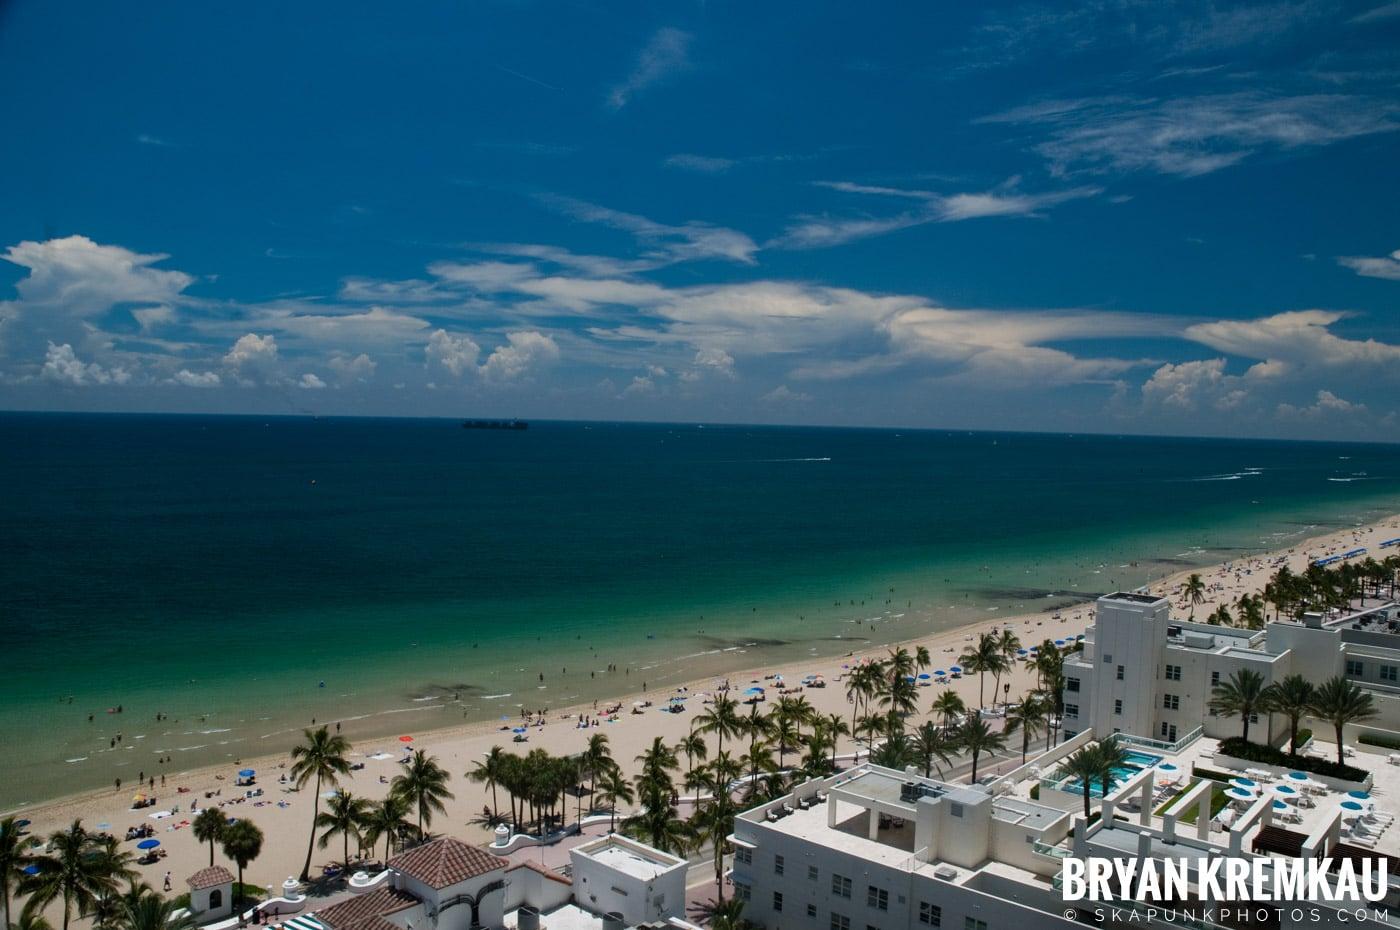 Florida Keys Vacation - 7.09.10 - 7.15.10 (107)